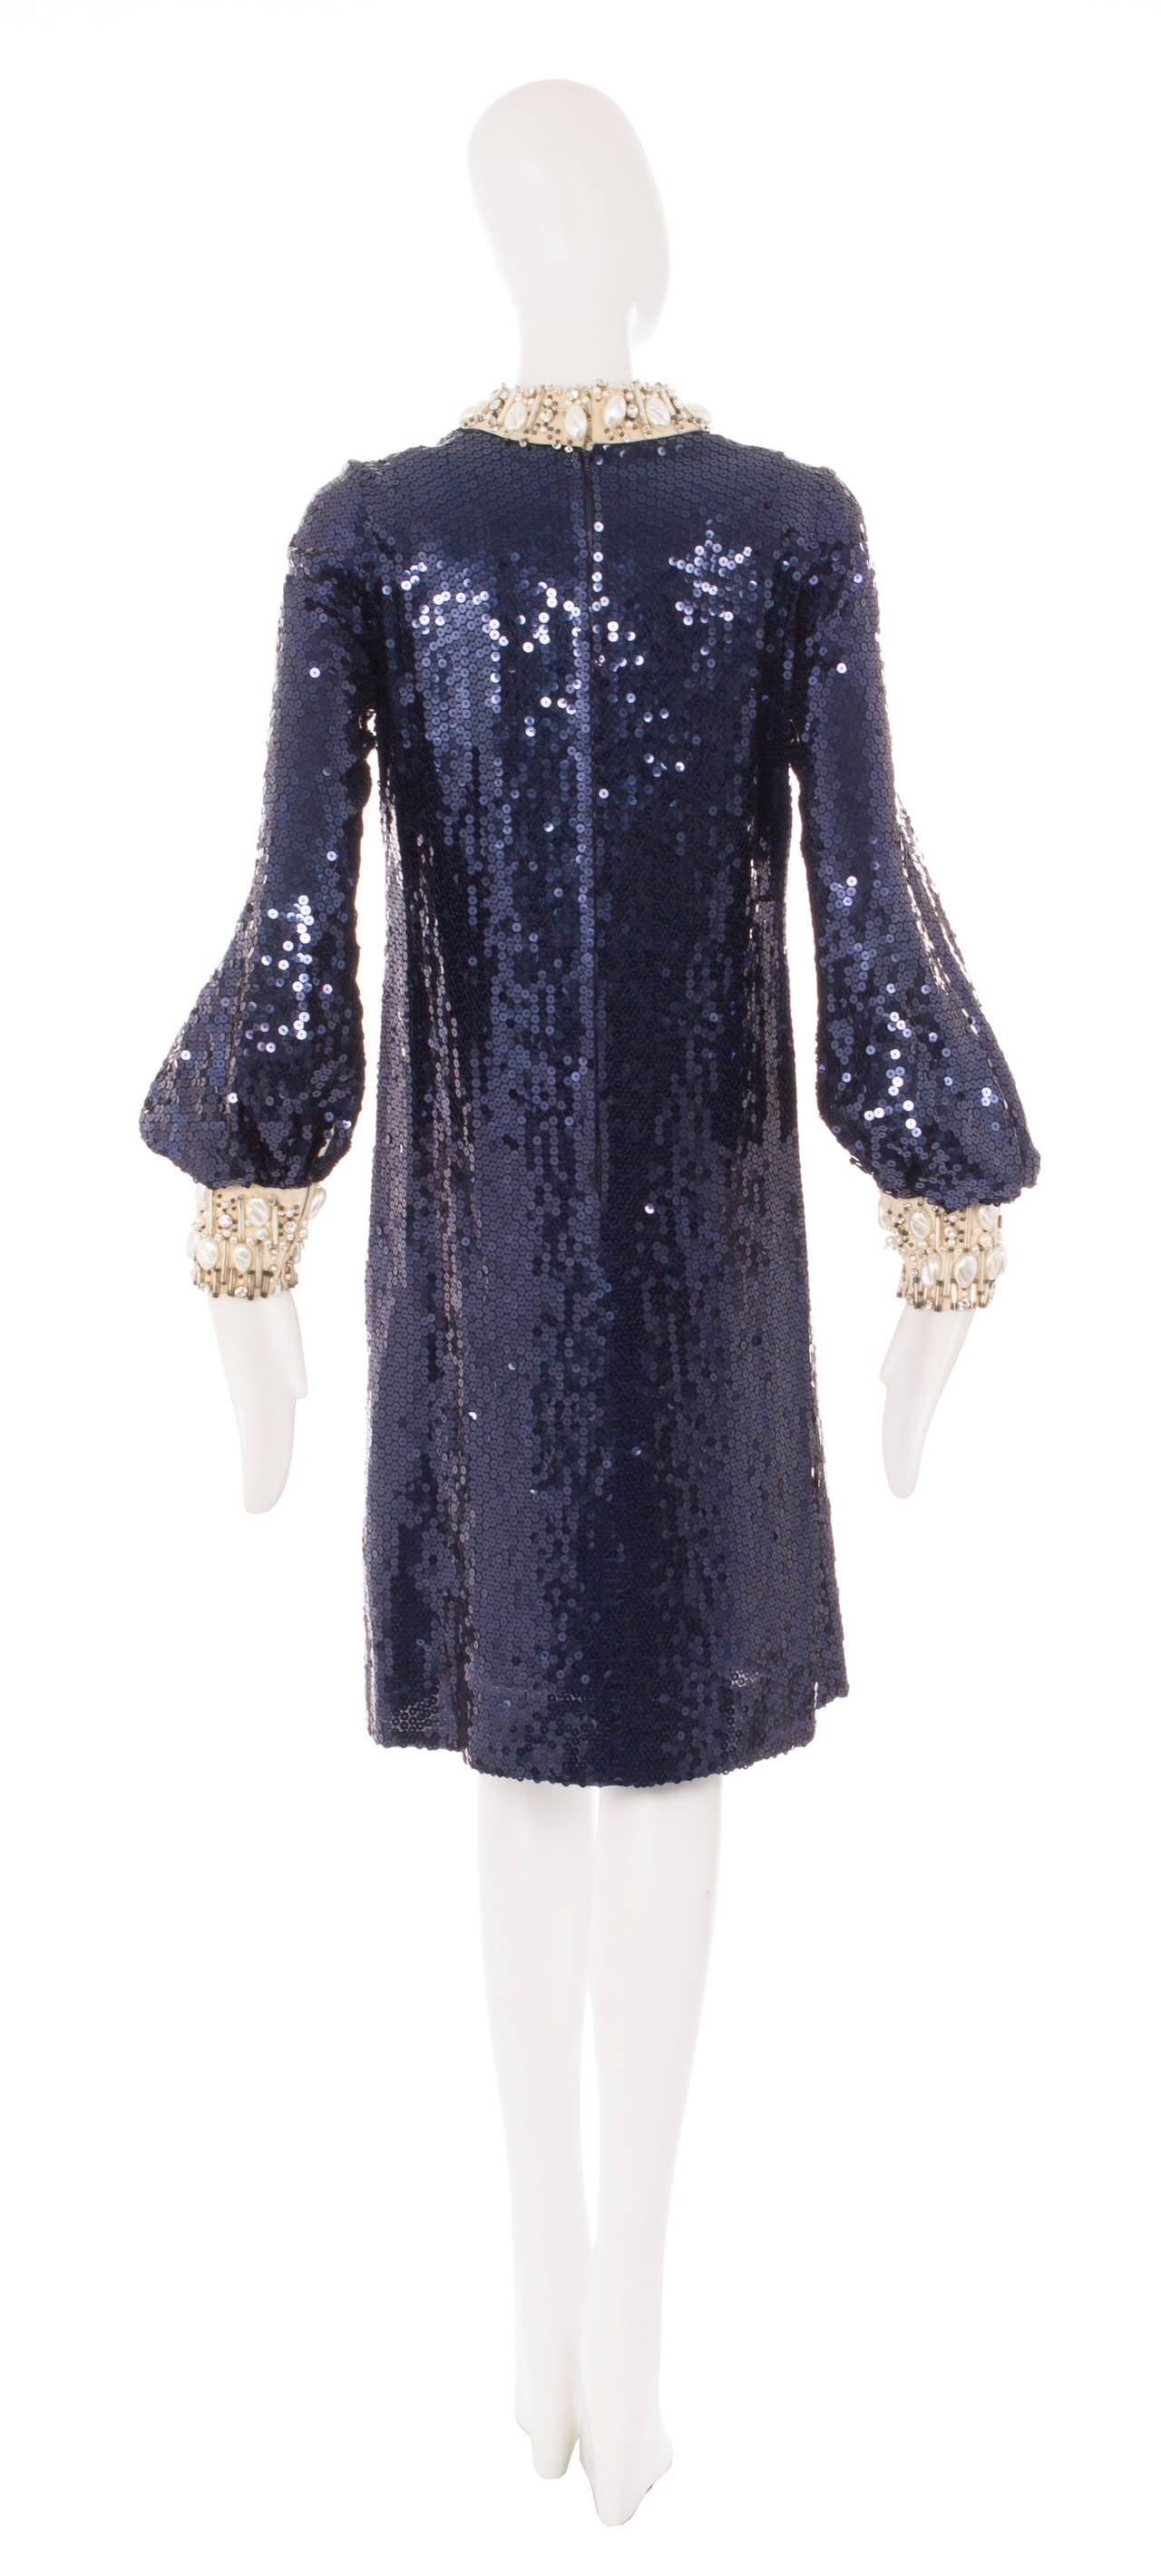 A pierre balmain haute couture dress circa 1968 for sale for Haute couture sale